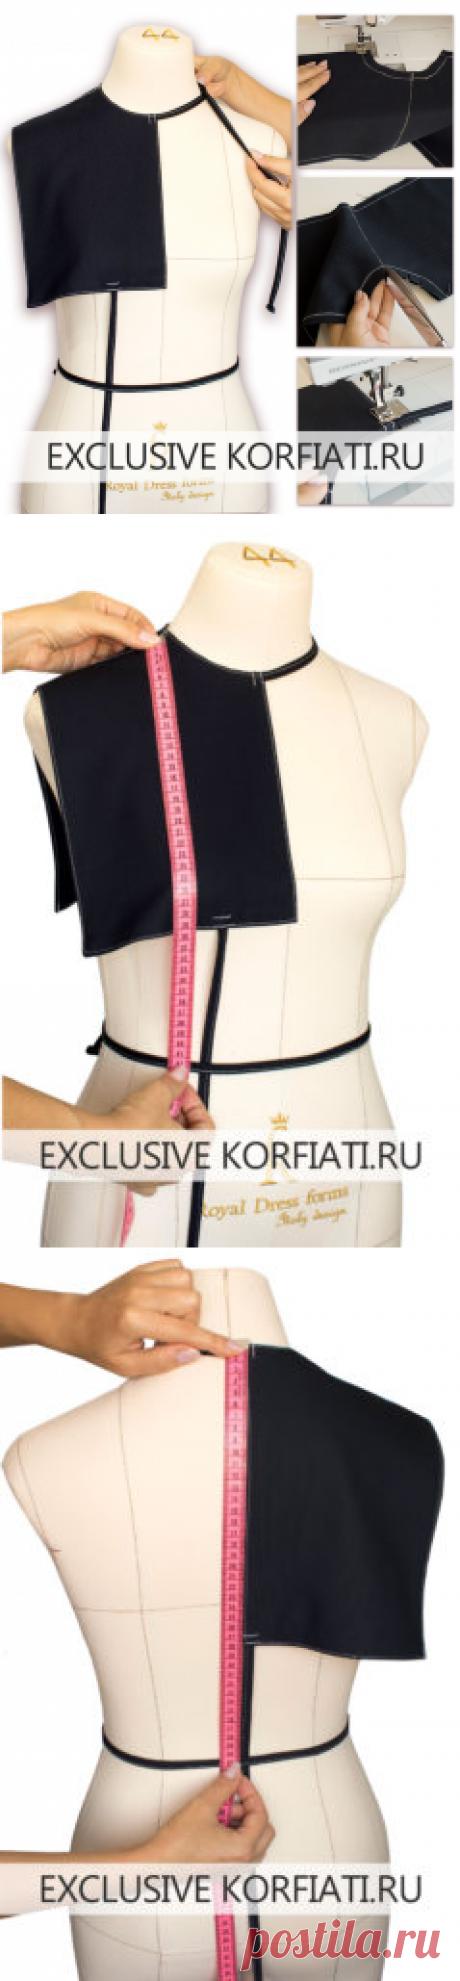 Как сшить плечевую накладку - мастер-класс Анастасии Корфиати